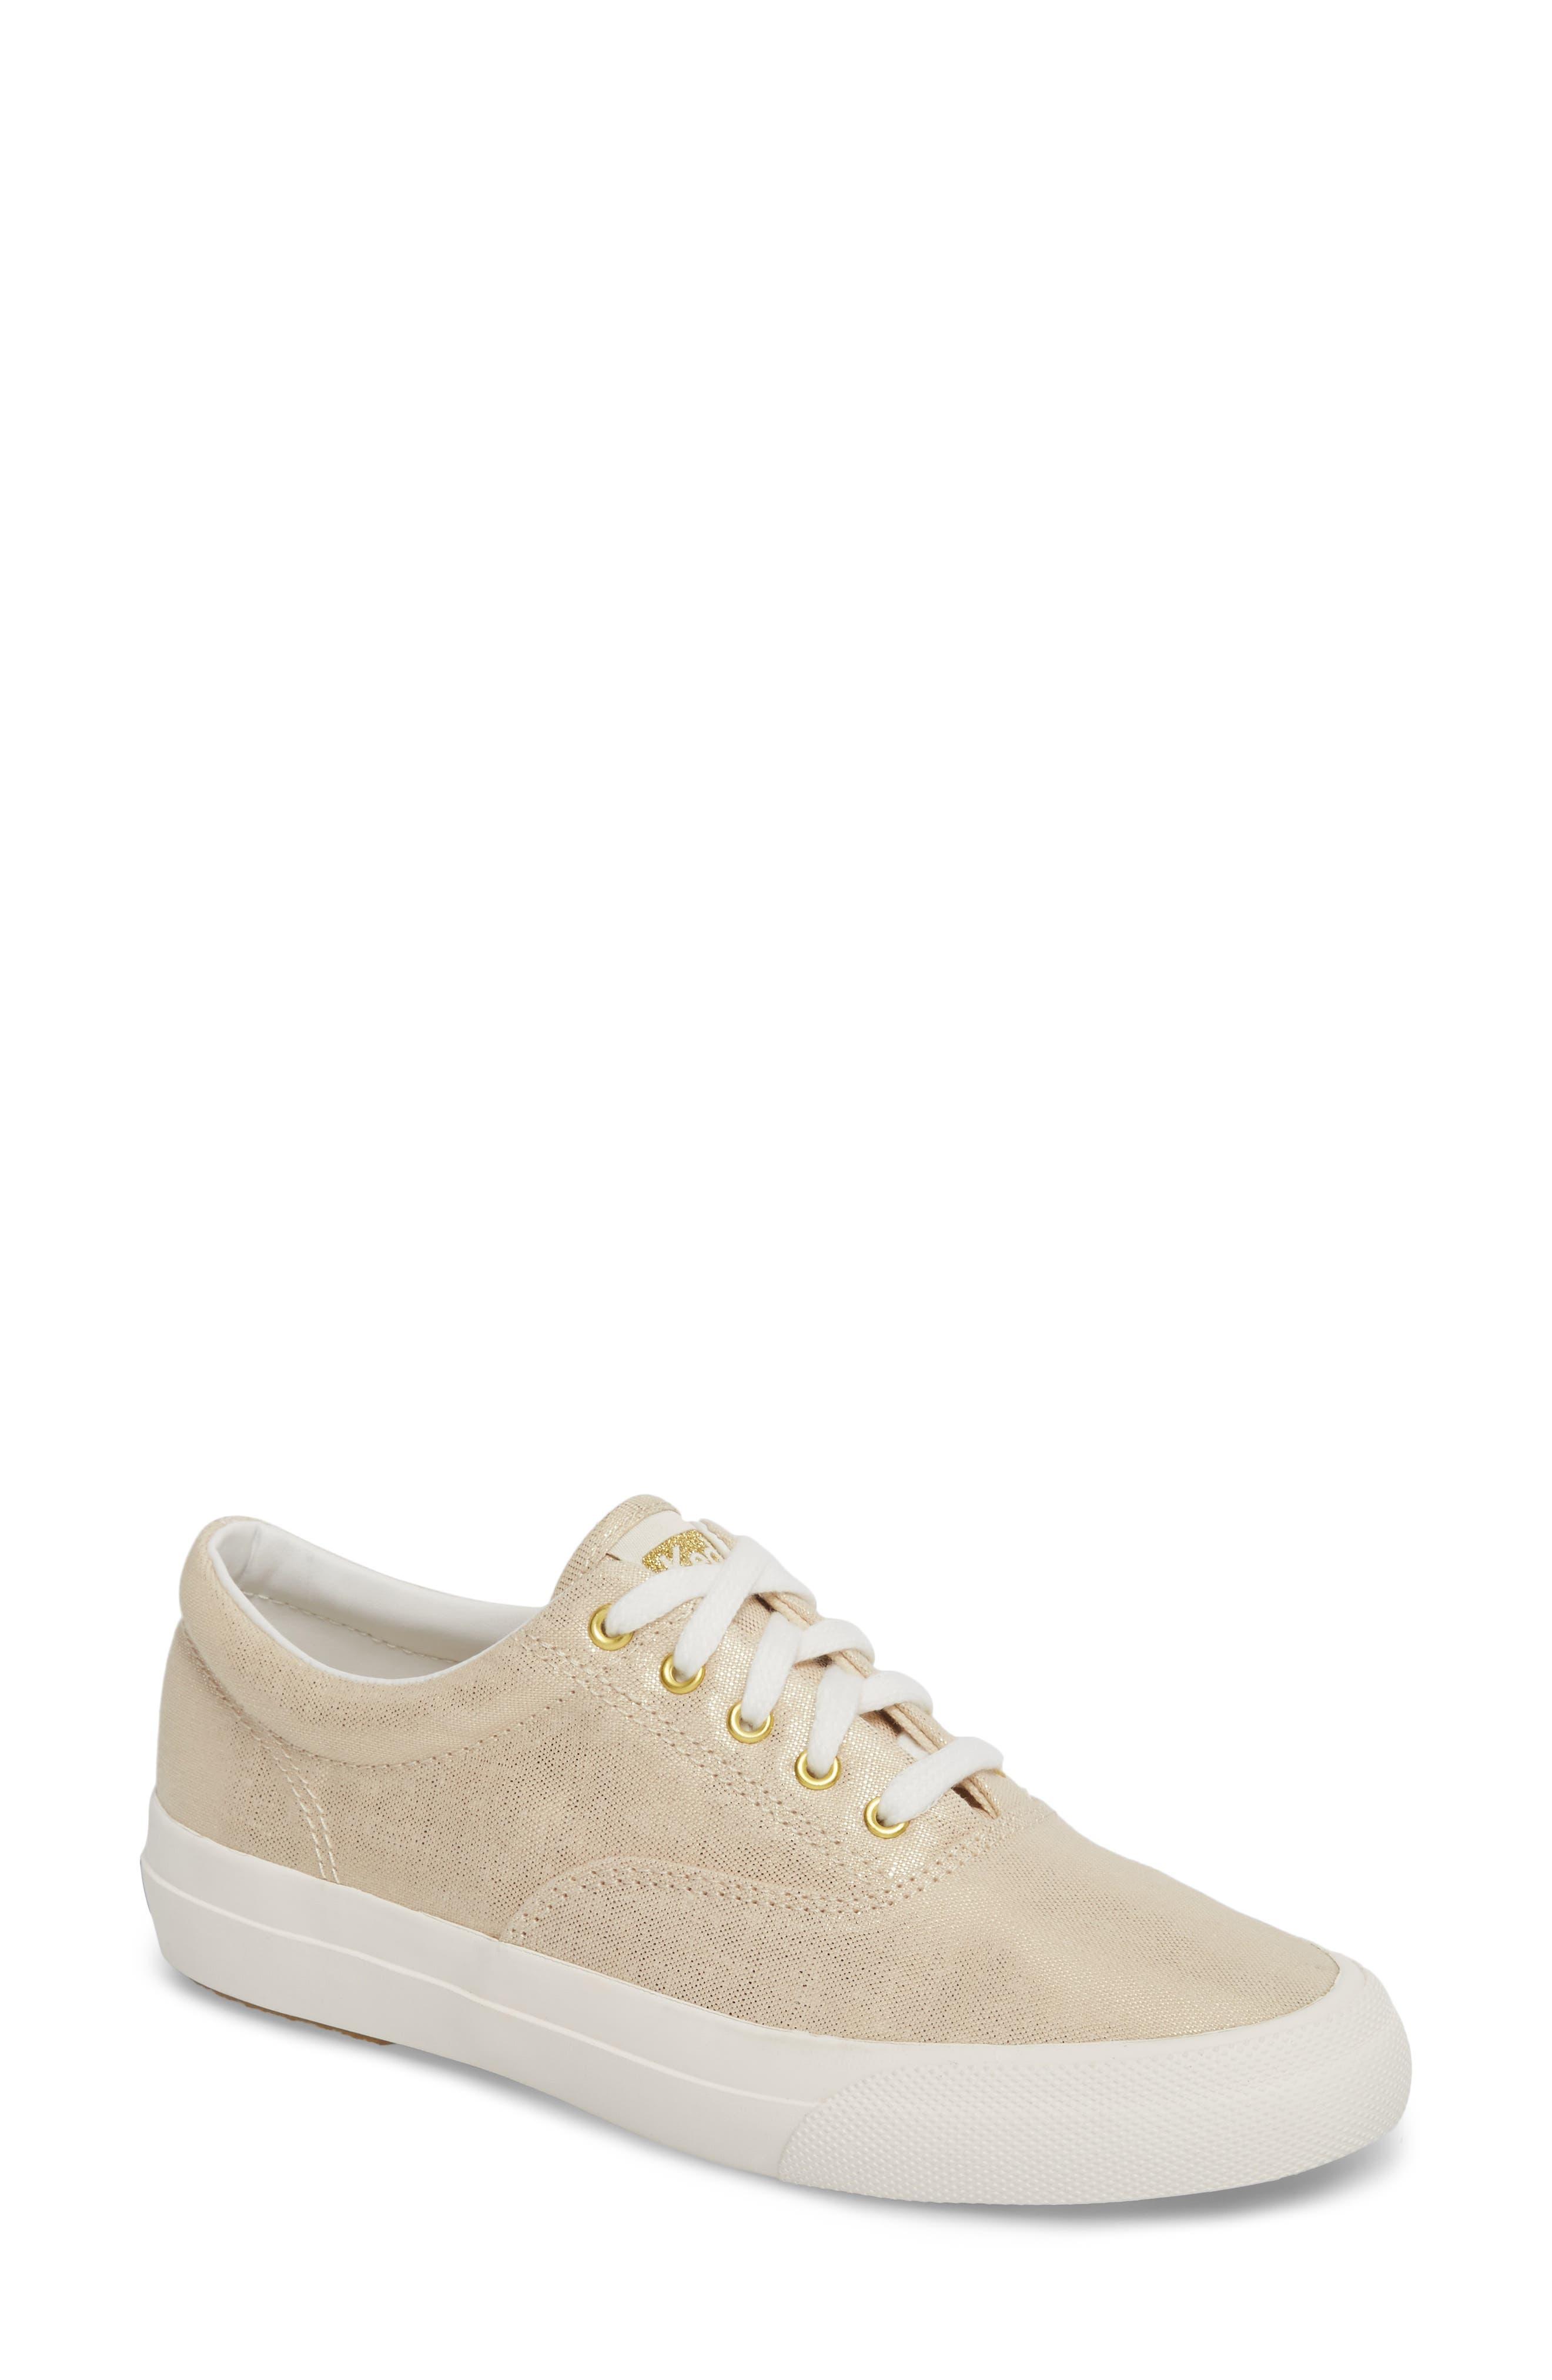 Main Image - Keds® Anchor Metallic Linen Sneaker (Women)